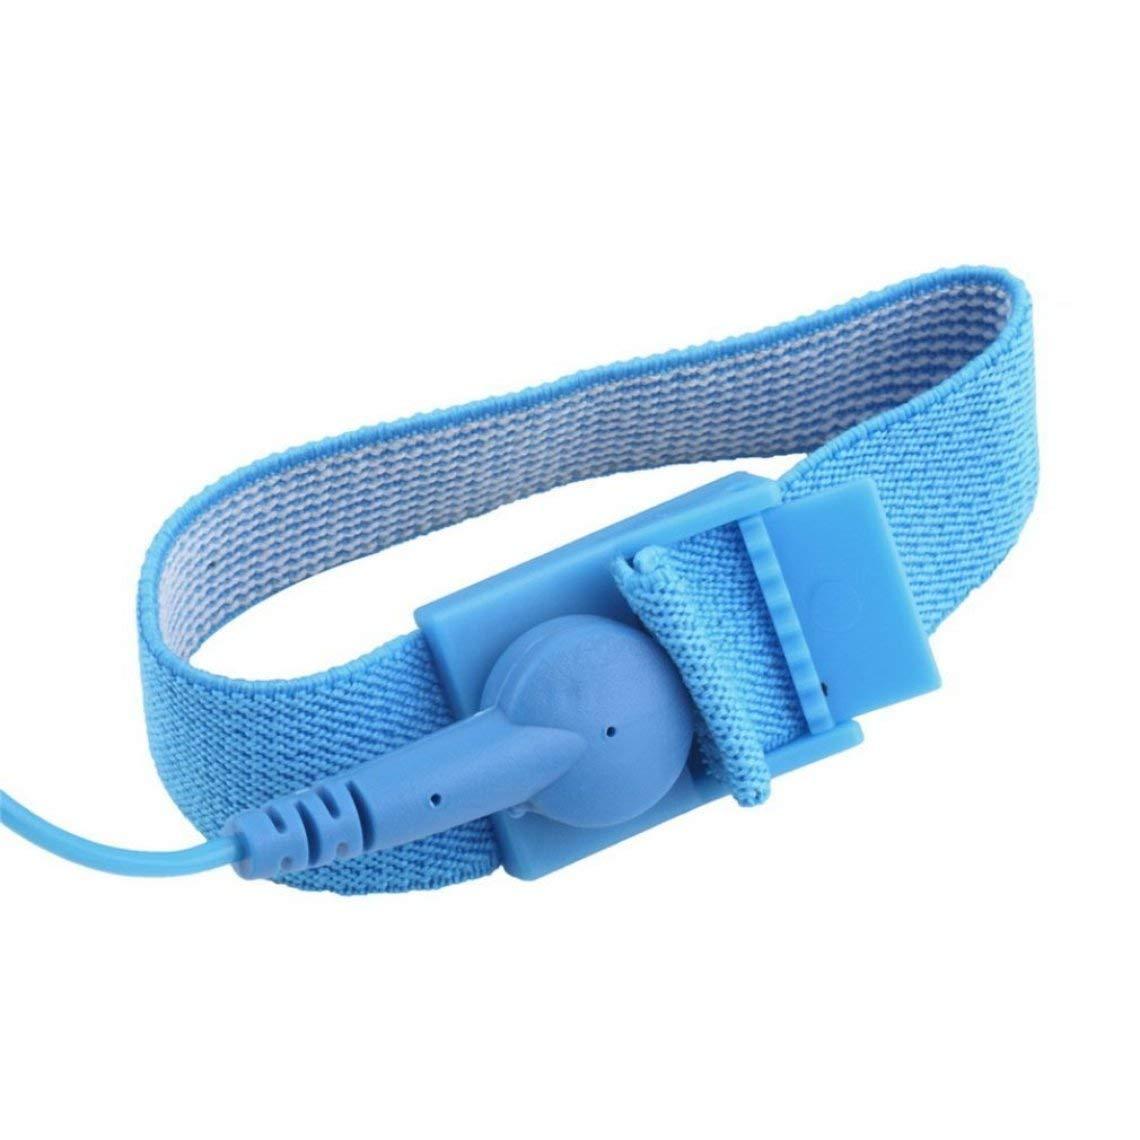 Zinniaya Anti Static ESD Wrist Strap Discharge Band Grounding Prevent Static Shock